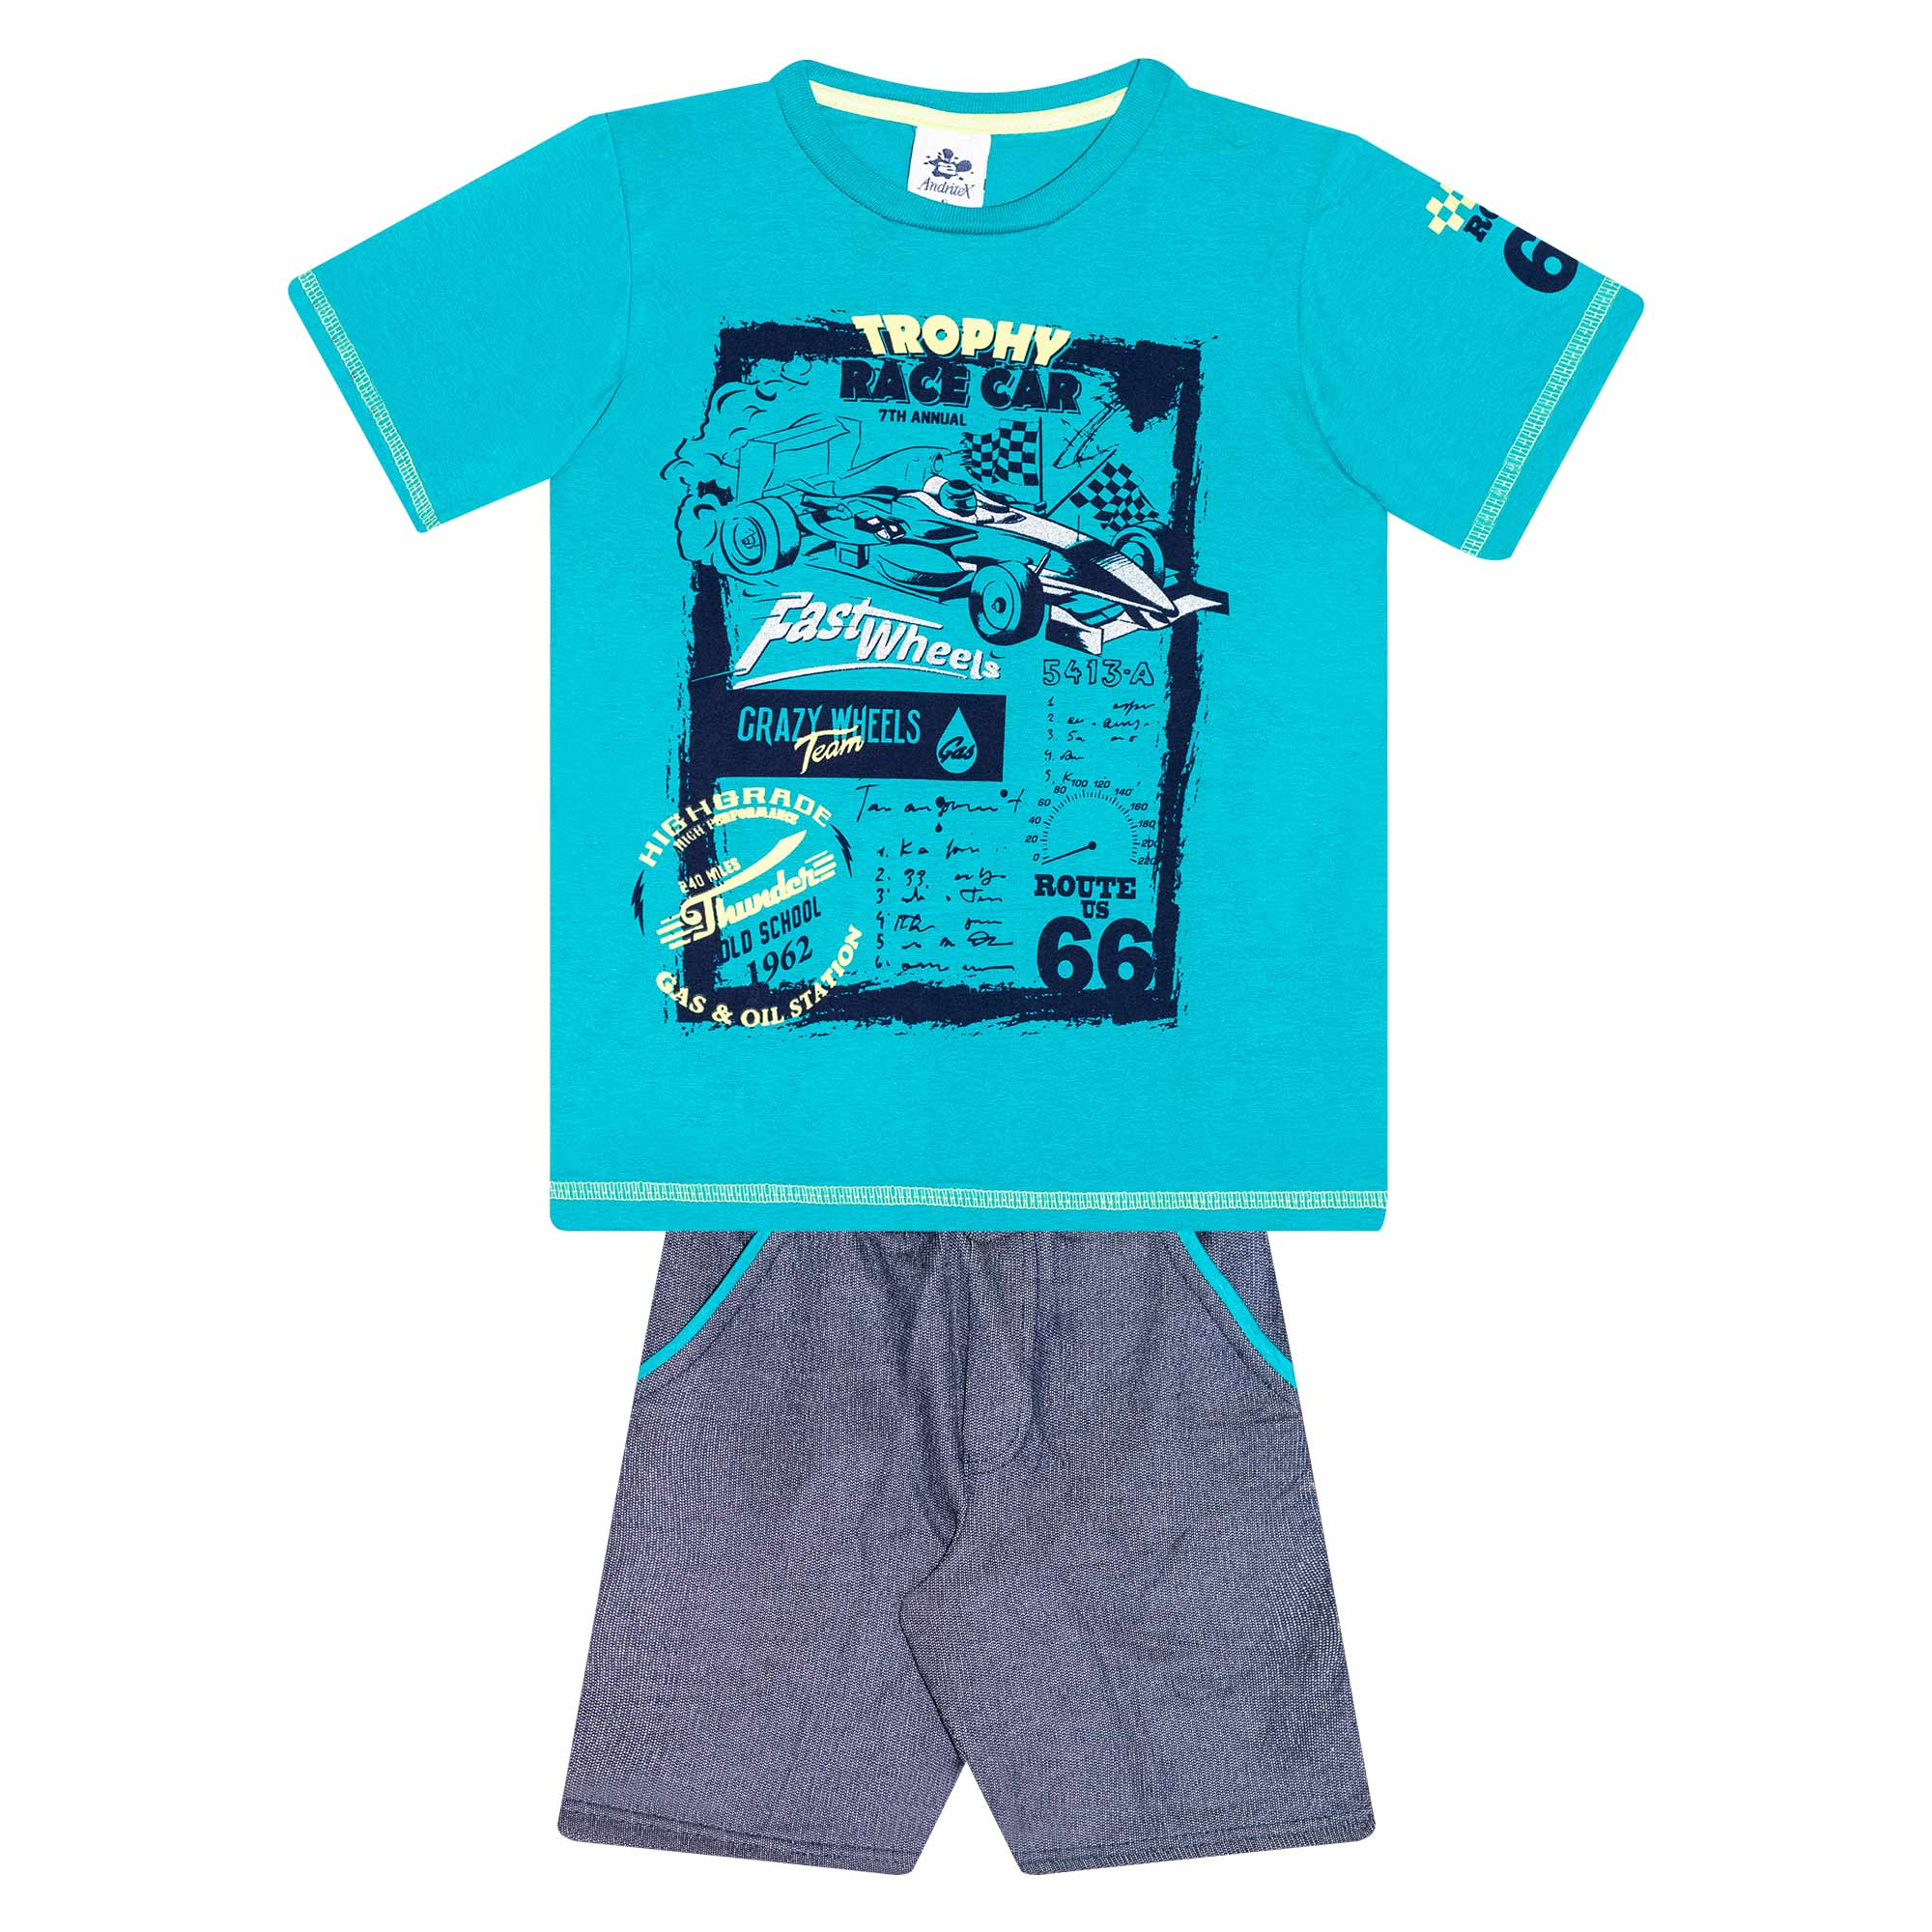 Conjunto Infantil Masculino - Ref 4773  - Verde - Andritex